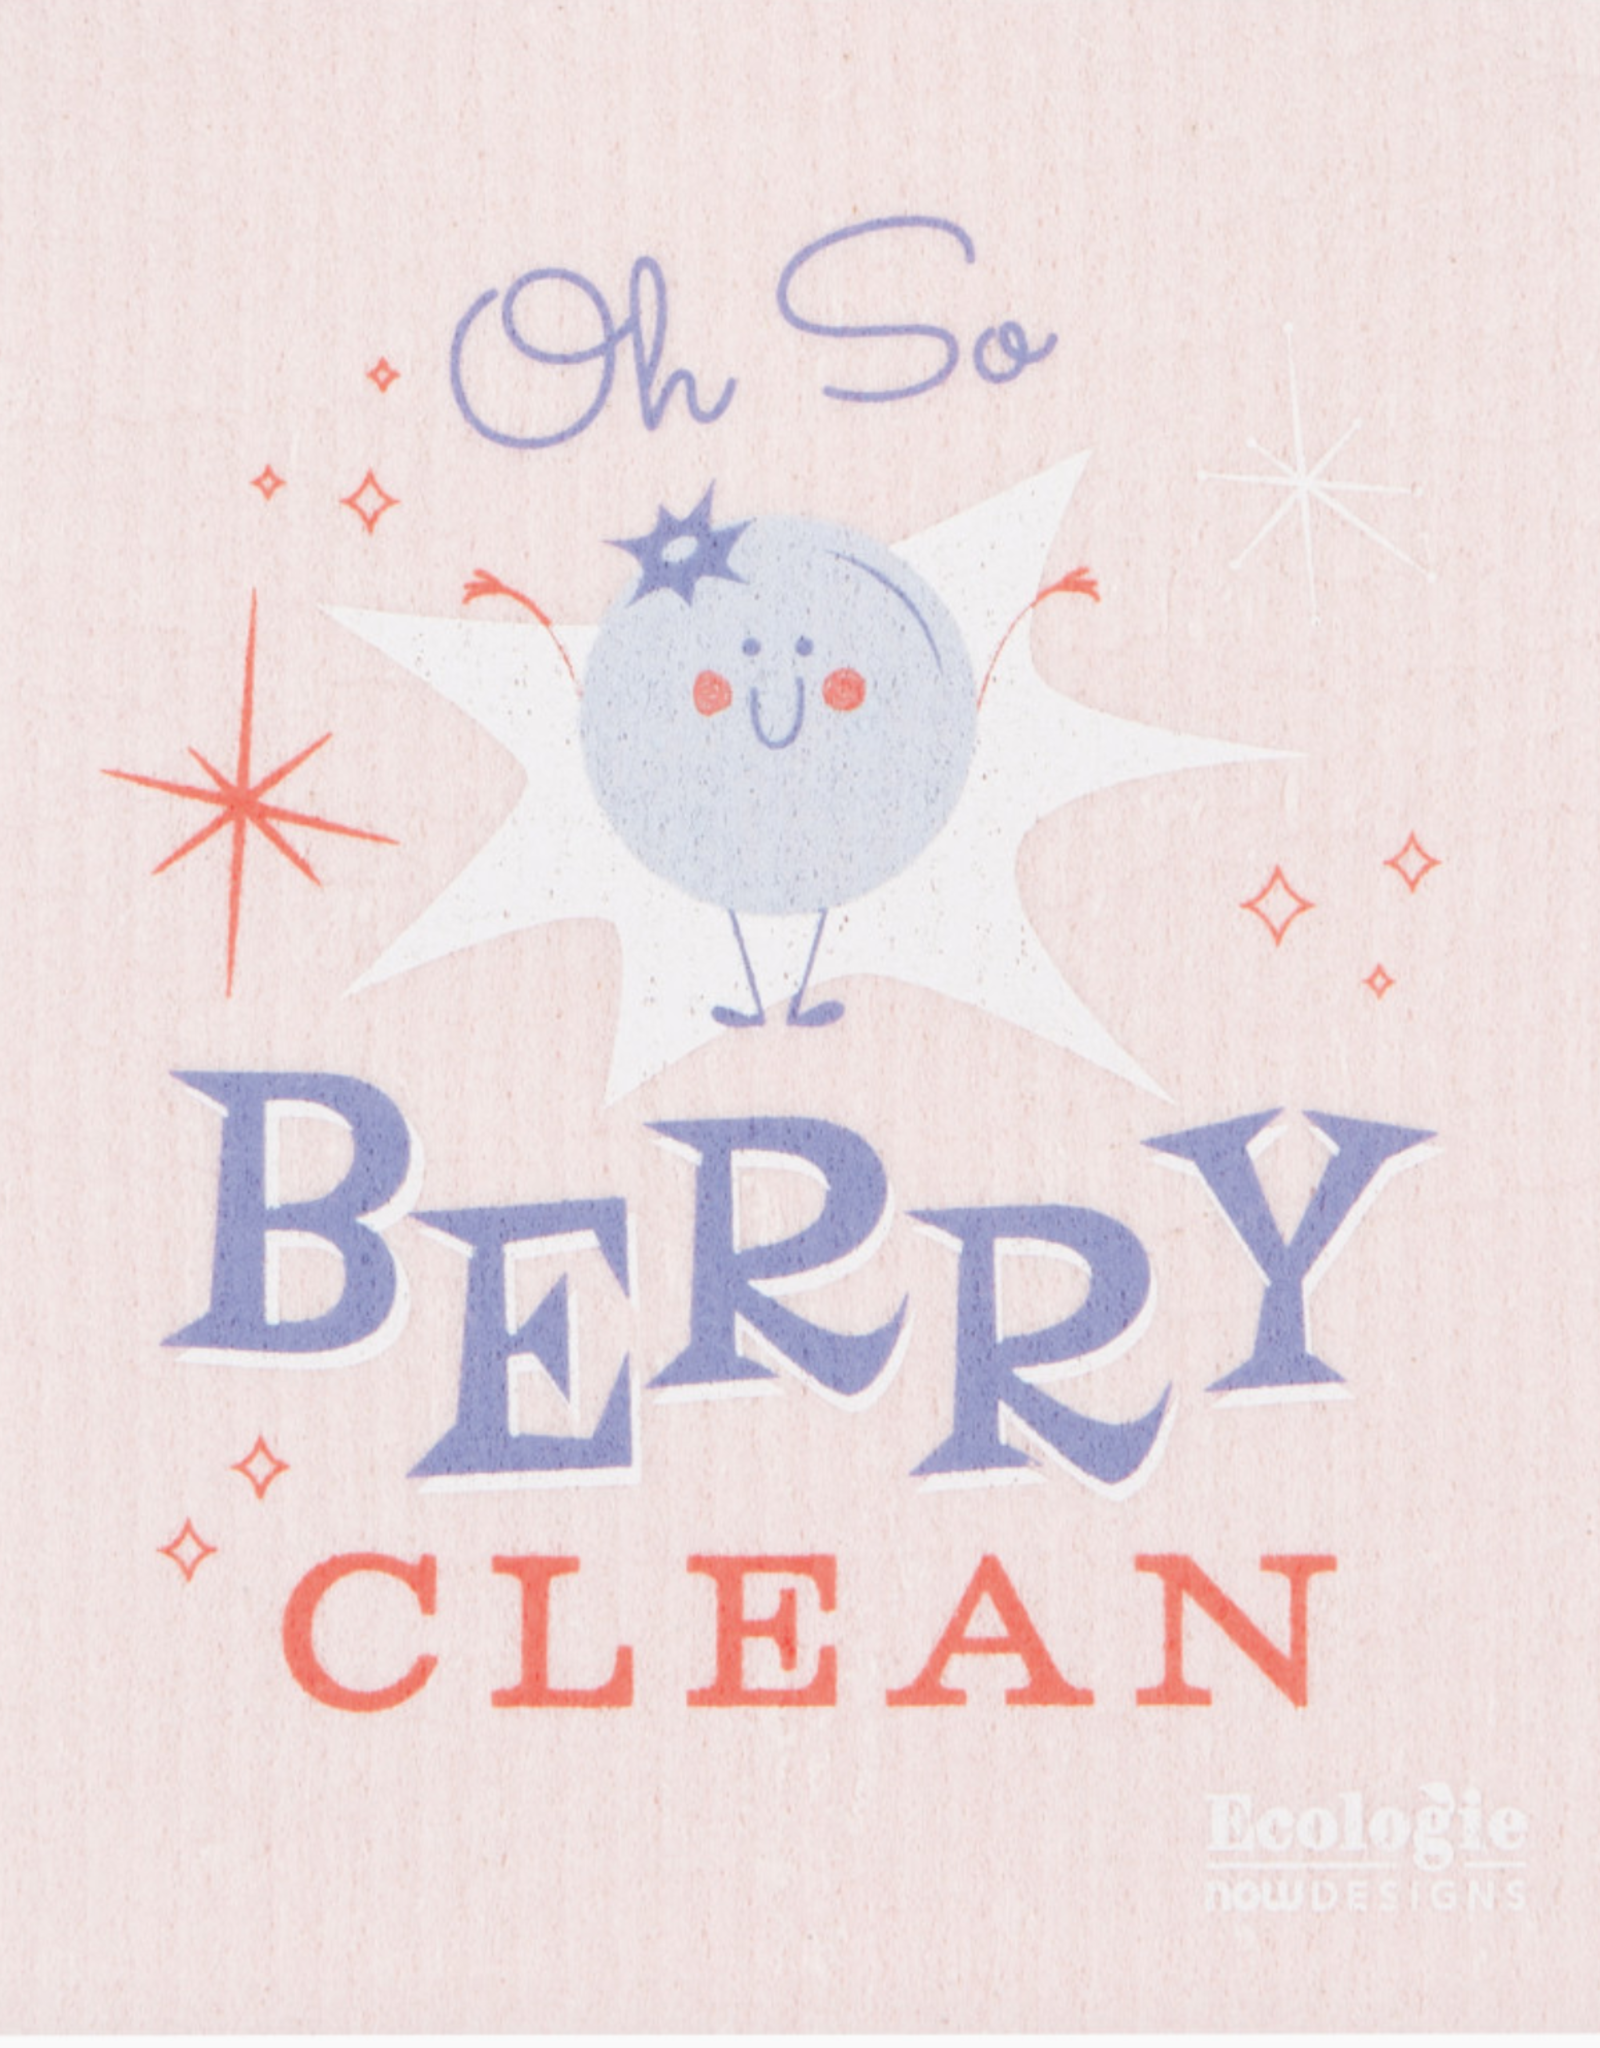 Danica Danica- Éco sponge Berry Clean